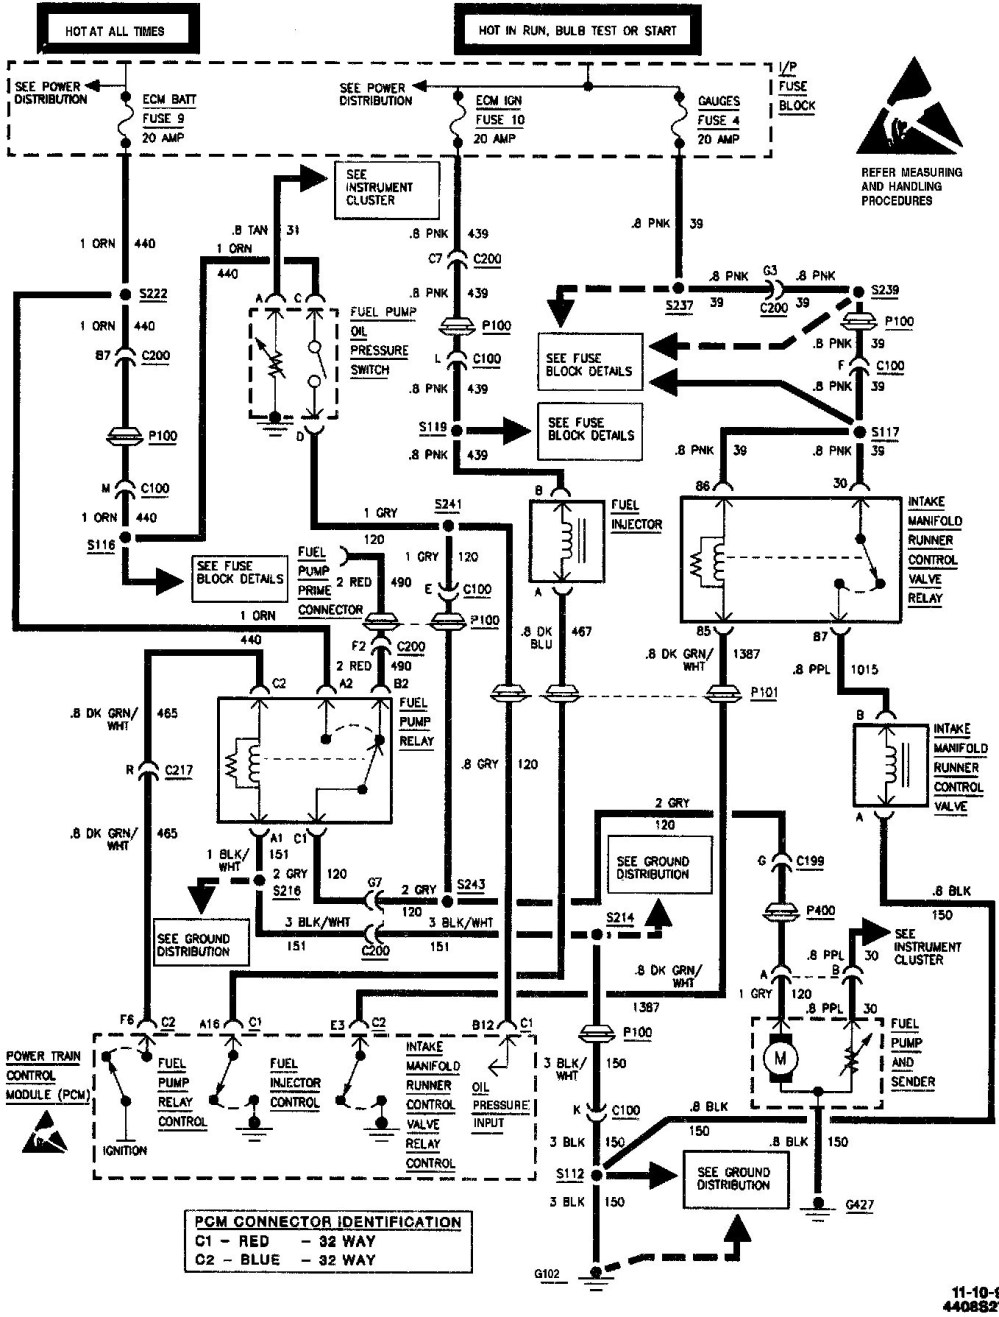 medium resolution of 1992 chevy 350 tbi vacuum diagram chevrolet wiring diagrams 1995 chevy silverado wiring diagram 1995 chevy